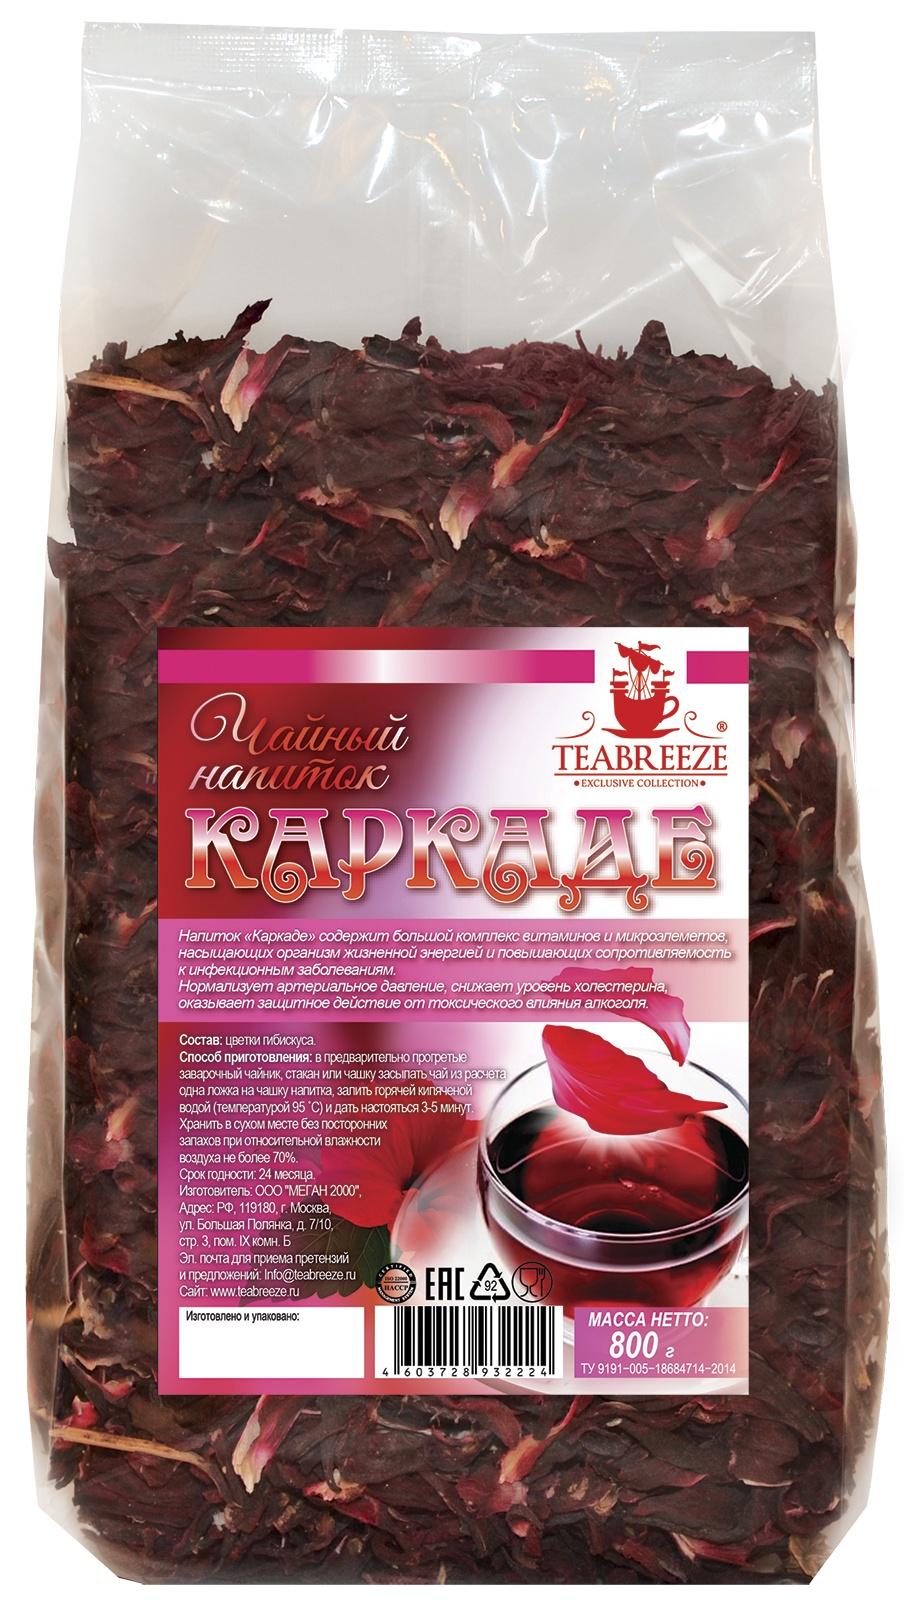 Чай листовой TEABREEZE TB 1304-800, Каркаде, 800г. мальва шток роза дабл кассис